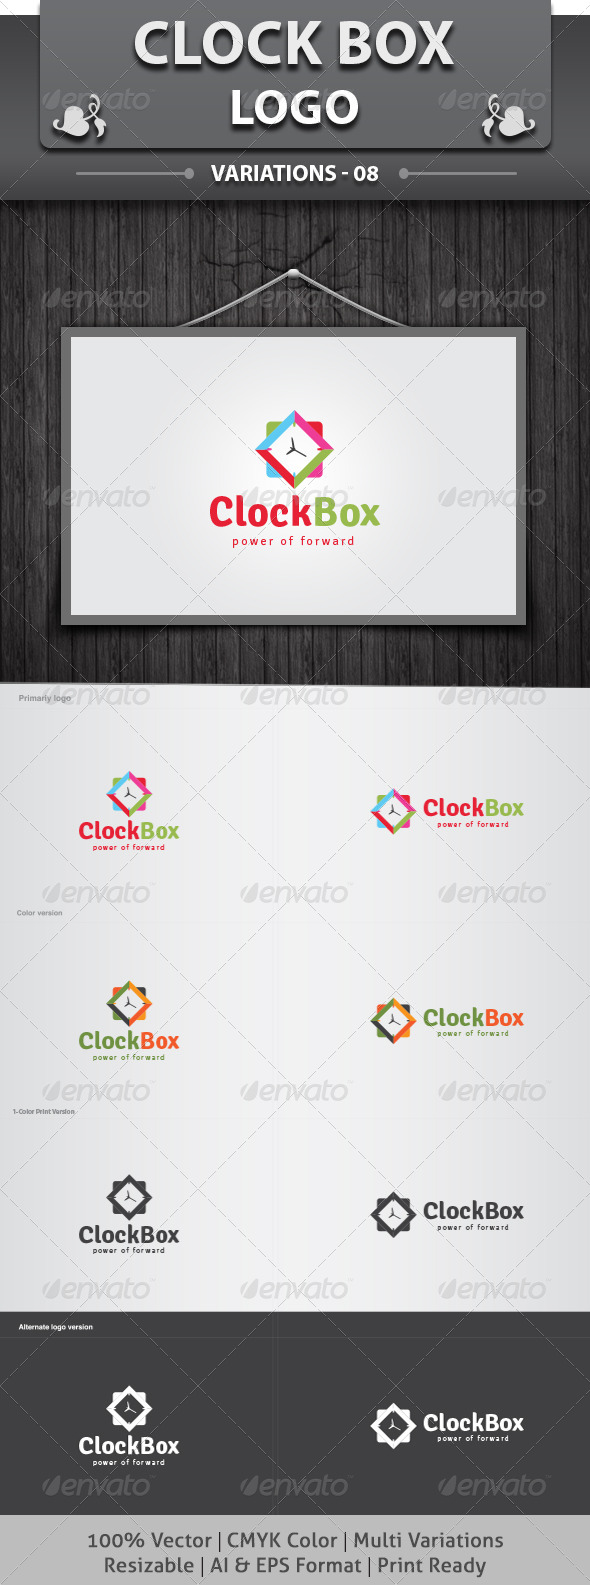 GraphicRiver Clock Box Logo 6234488